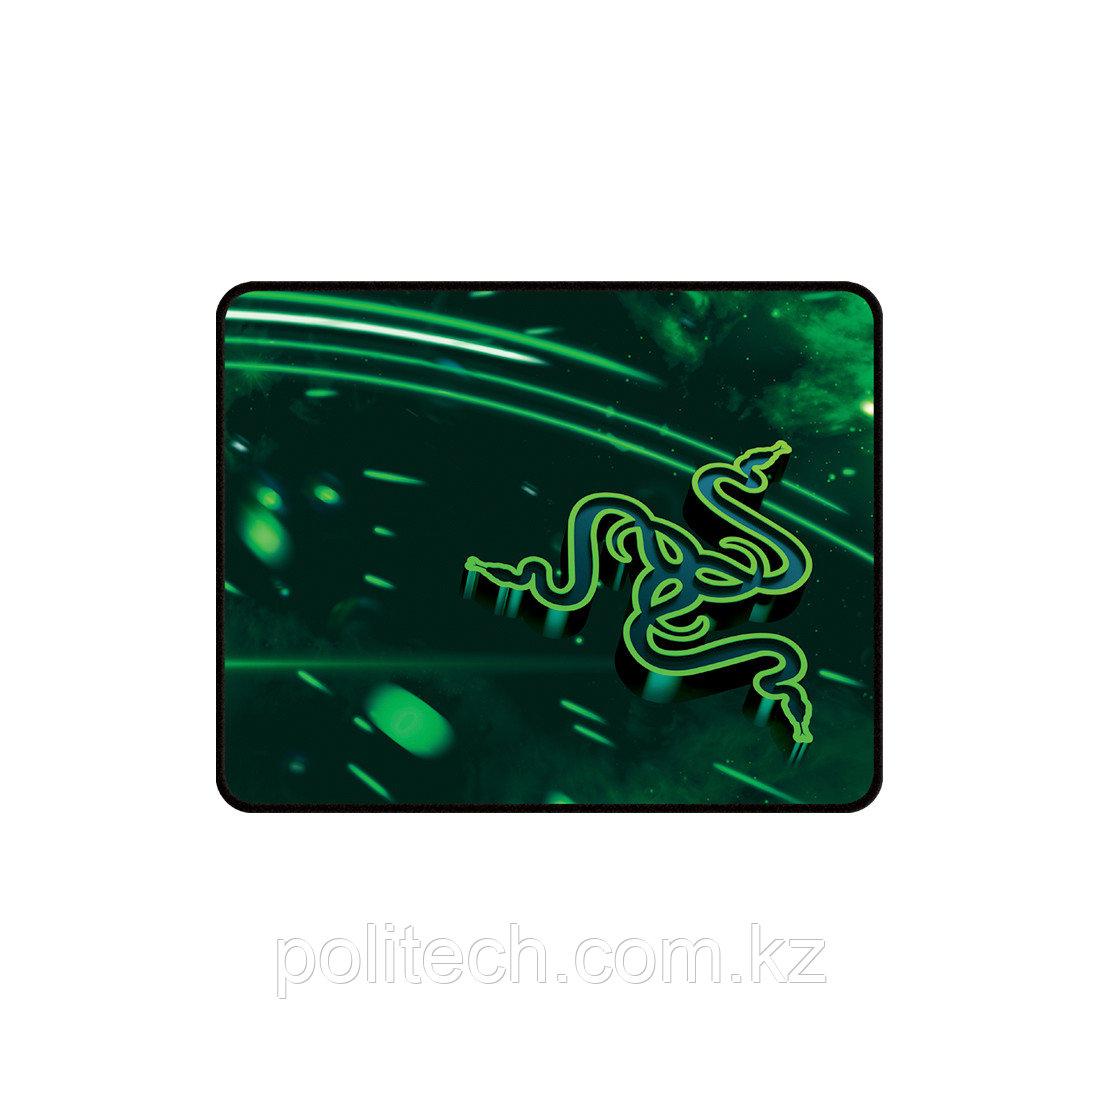 Коврик для компьютерной мыши Razer Goliathus Speed Cosmic Small